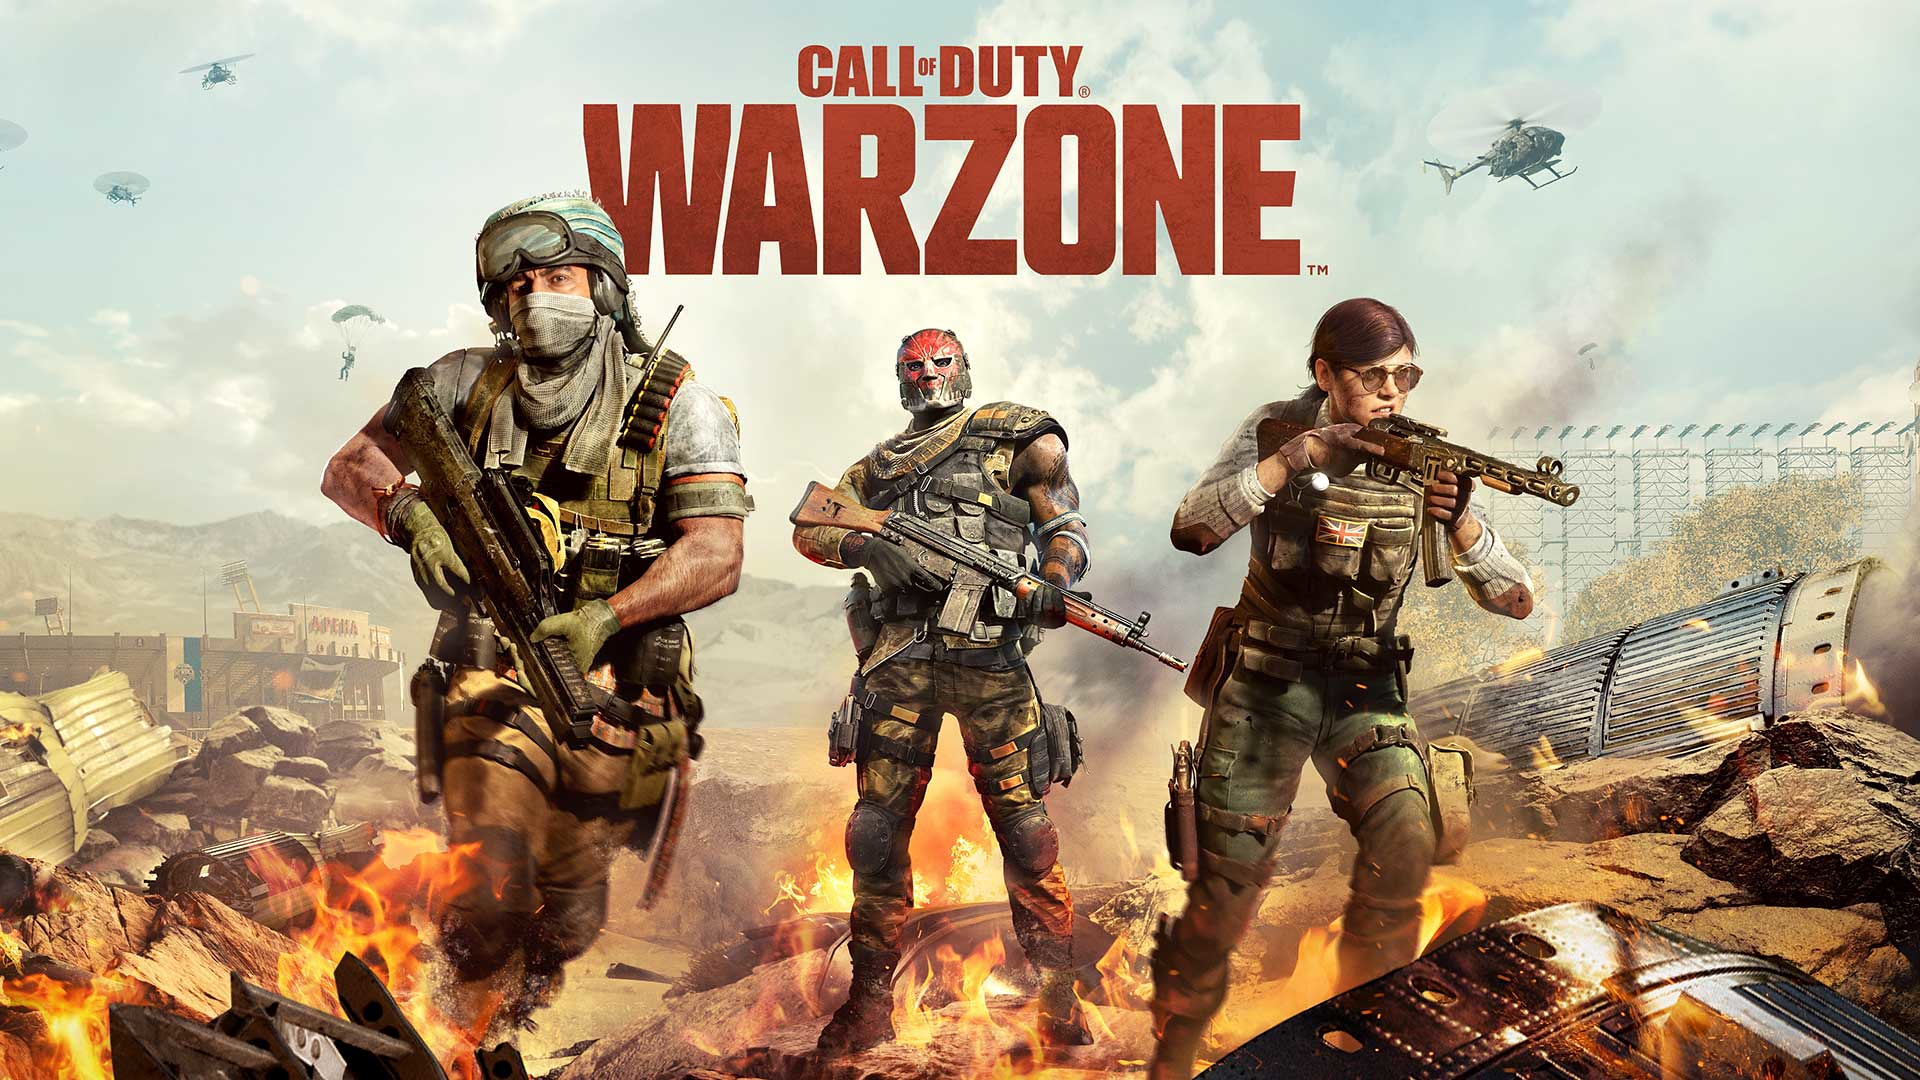 Call of Duty: Black Ops Cold War & Warzone (Season 4)